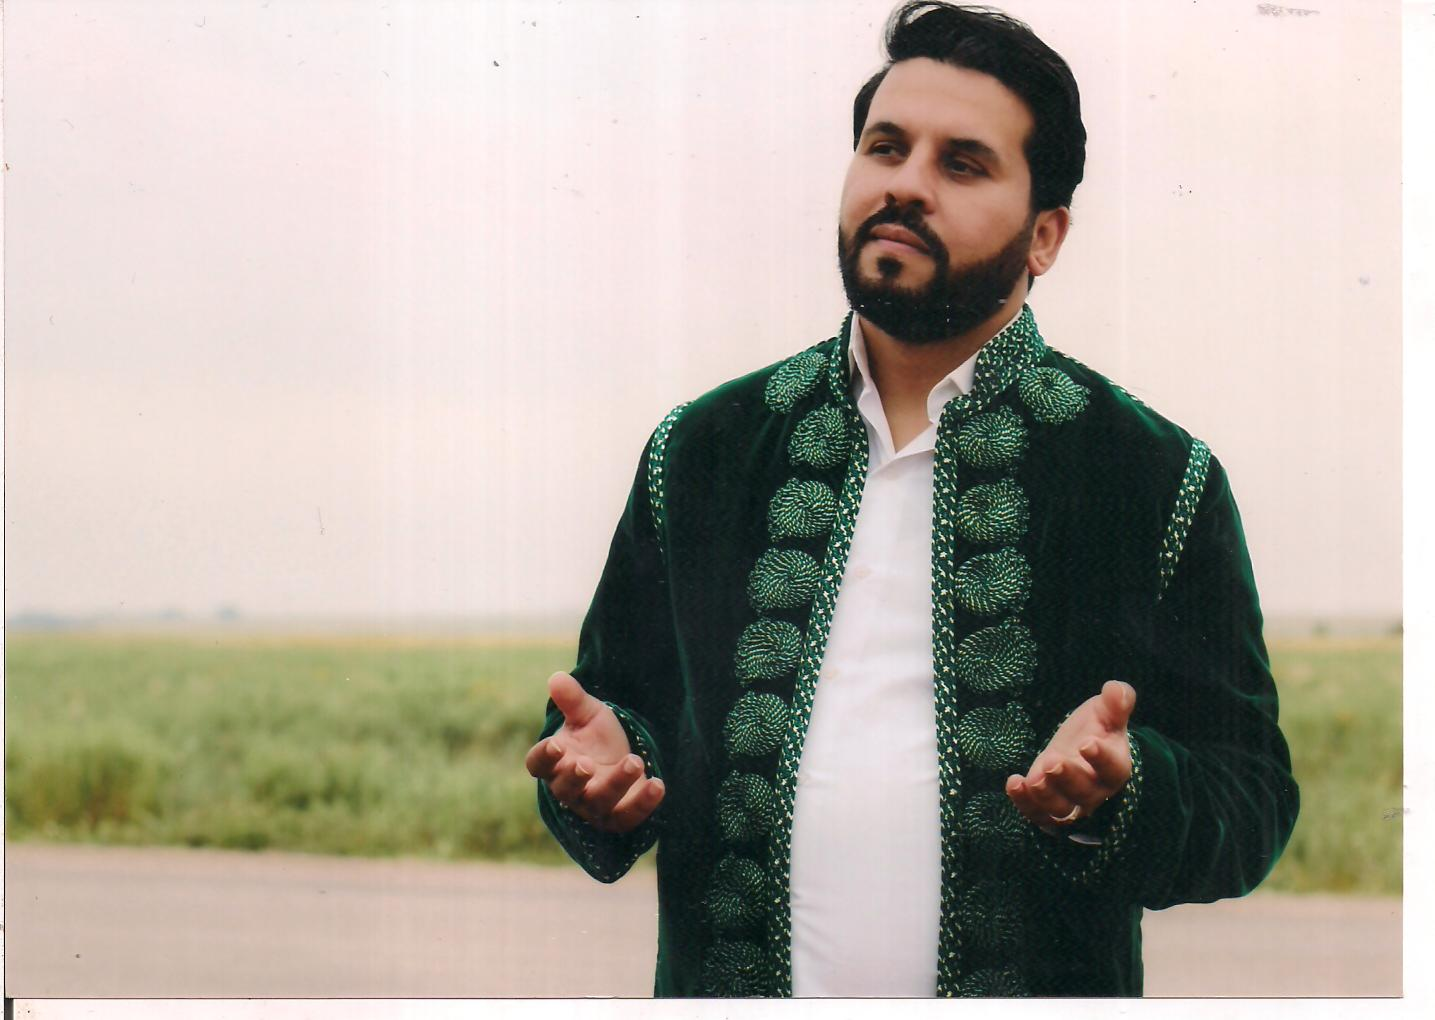 L'artiste Nabil Chamy revivifie le patrimoine rural marocain